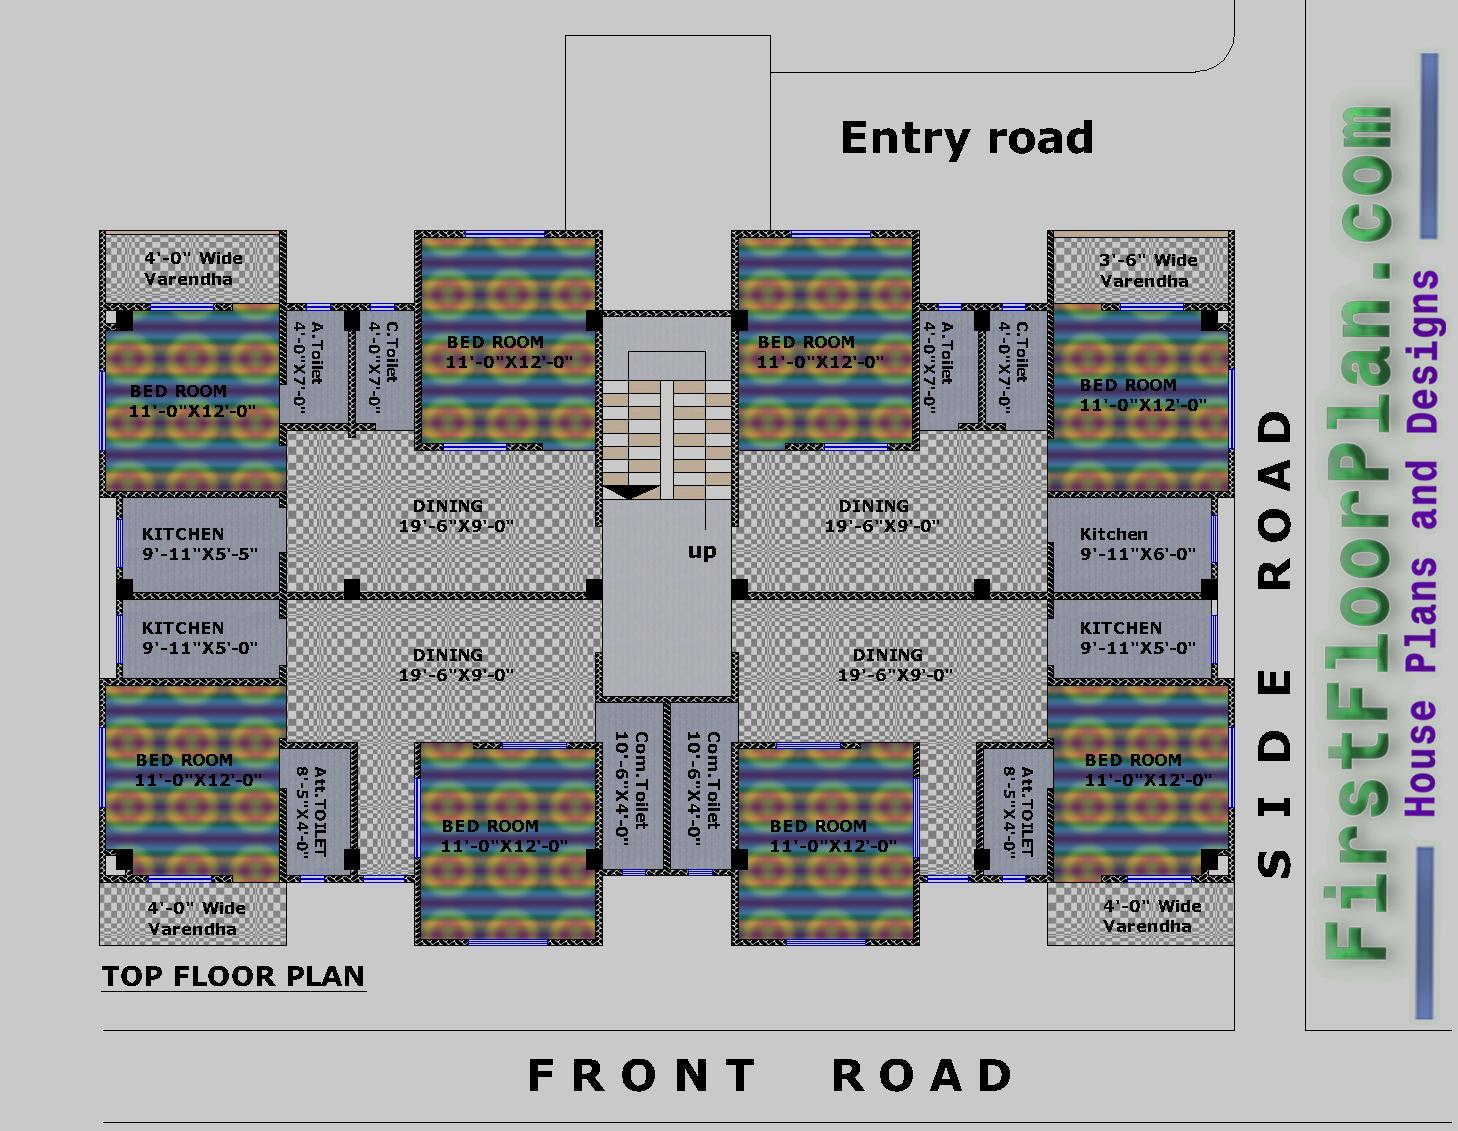 4500 square foot building plan, Top Floor Plan